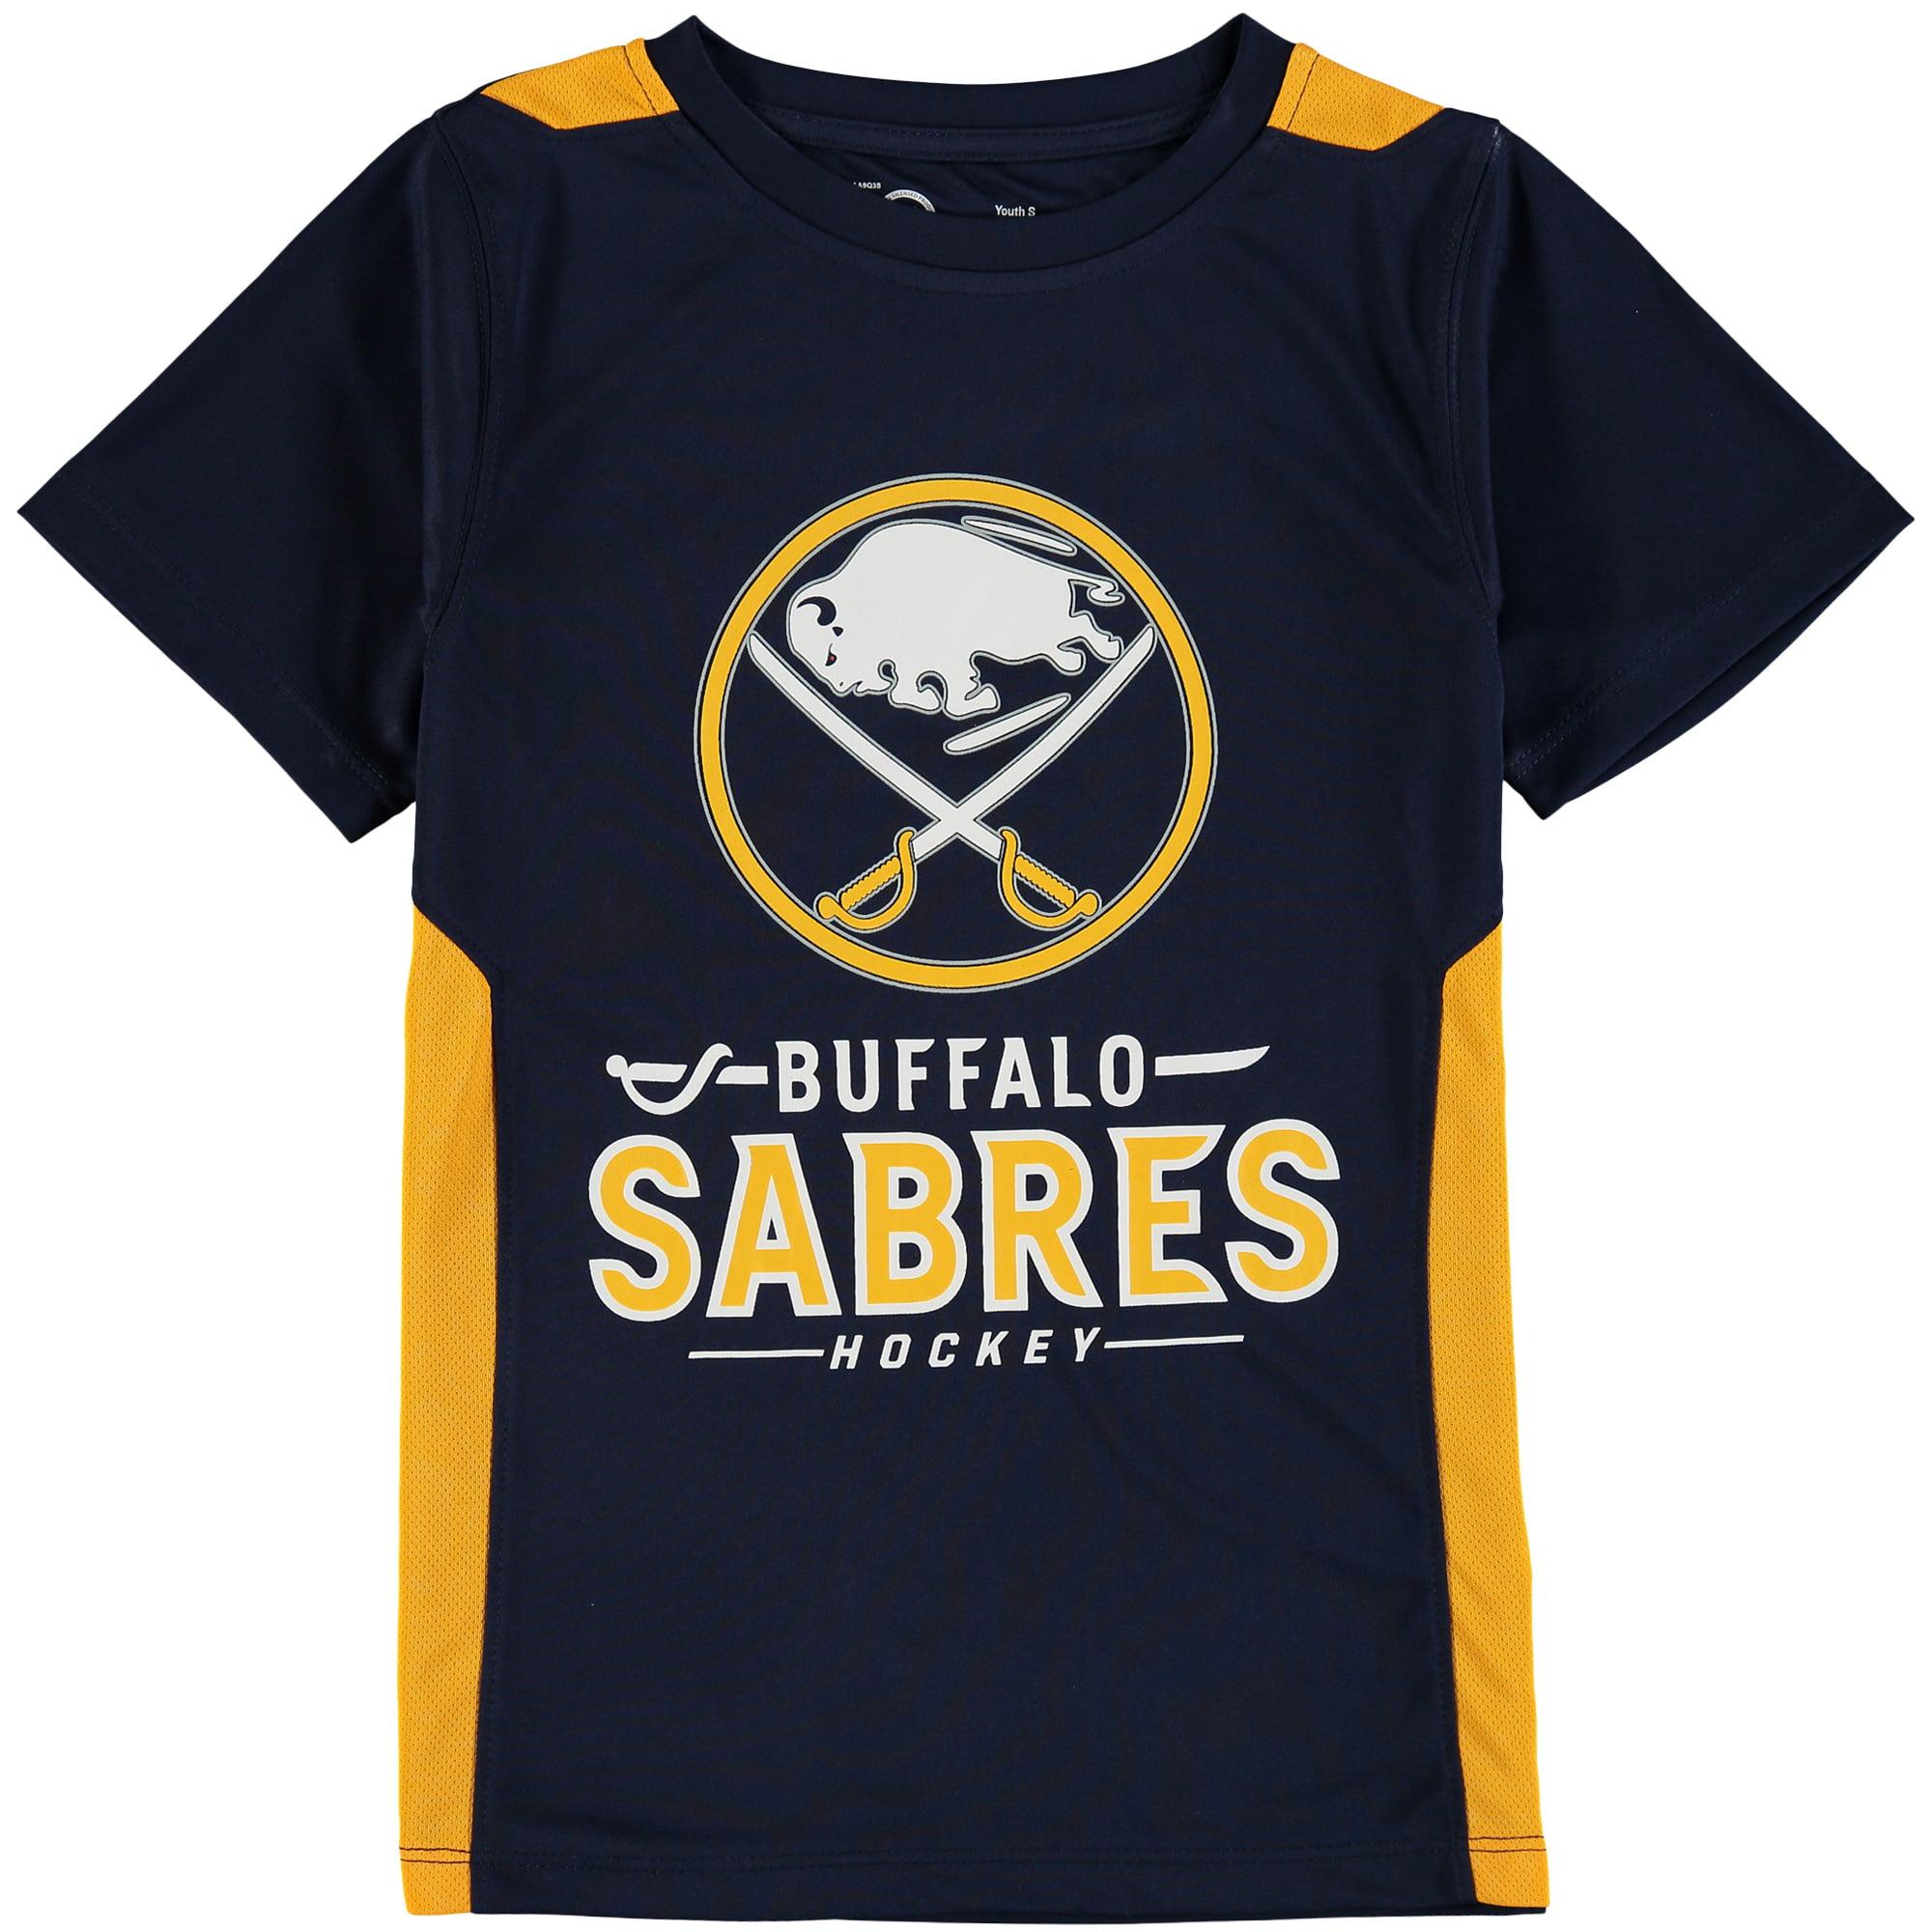 Buffalo Sabres Fanatics Branded Youth Lockup Poly Colorblock T-Shirt - Navy